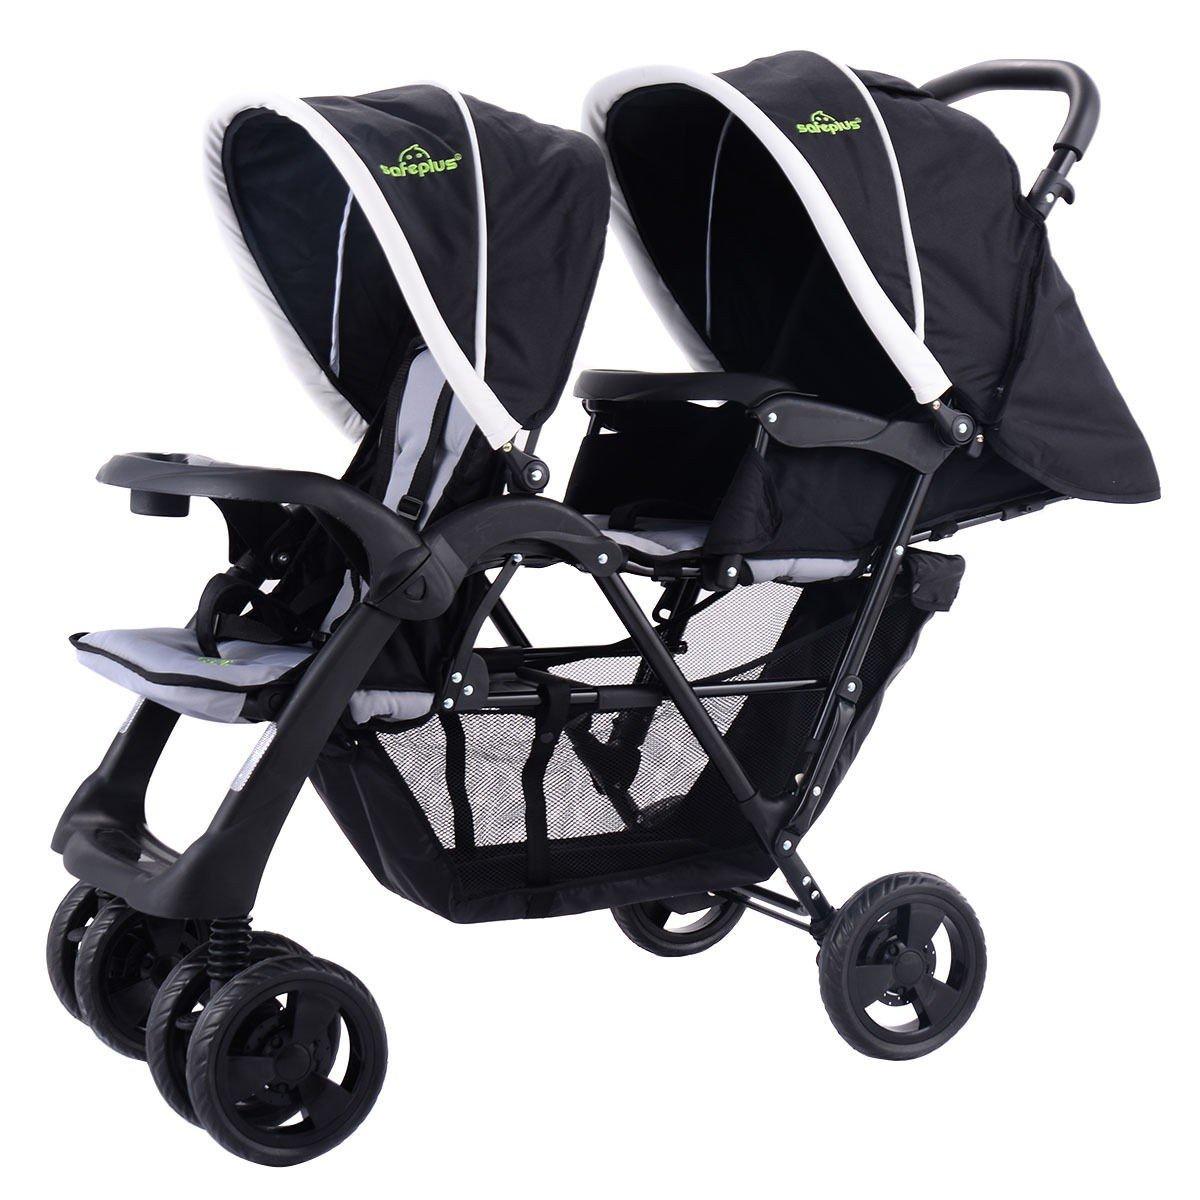 MD Group Kids Pushchair Stroller Foldable Twin Baby Jogger Heavy-duty Steel Frame Double Stroller